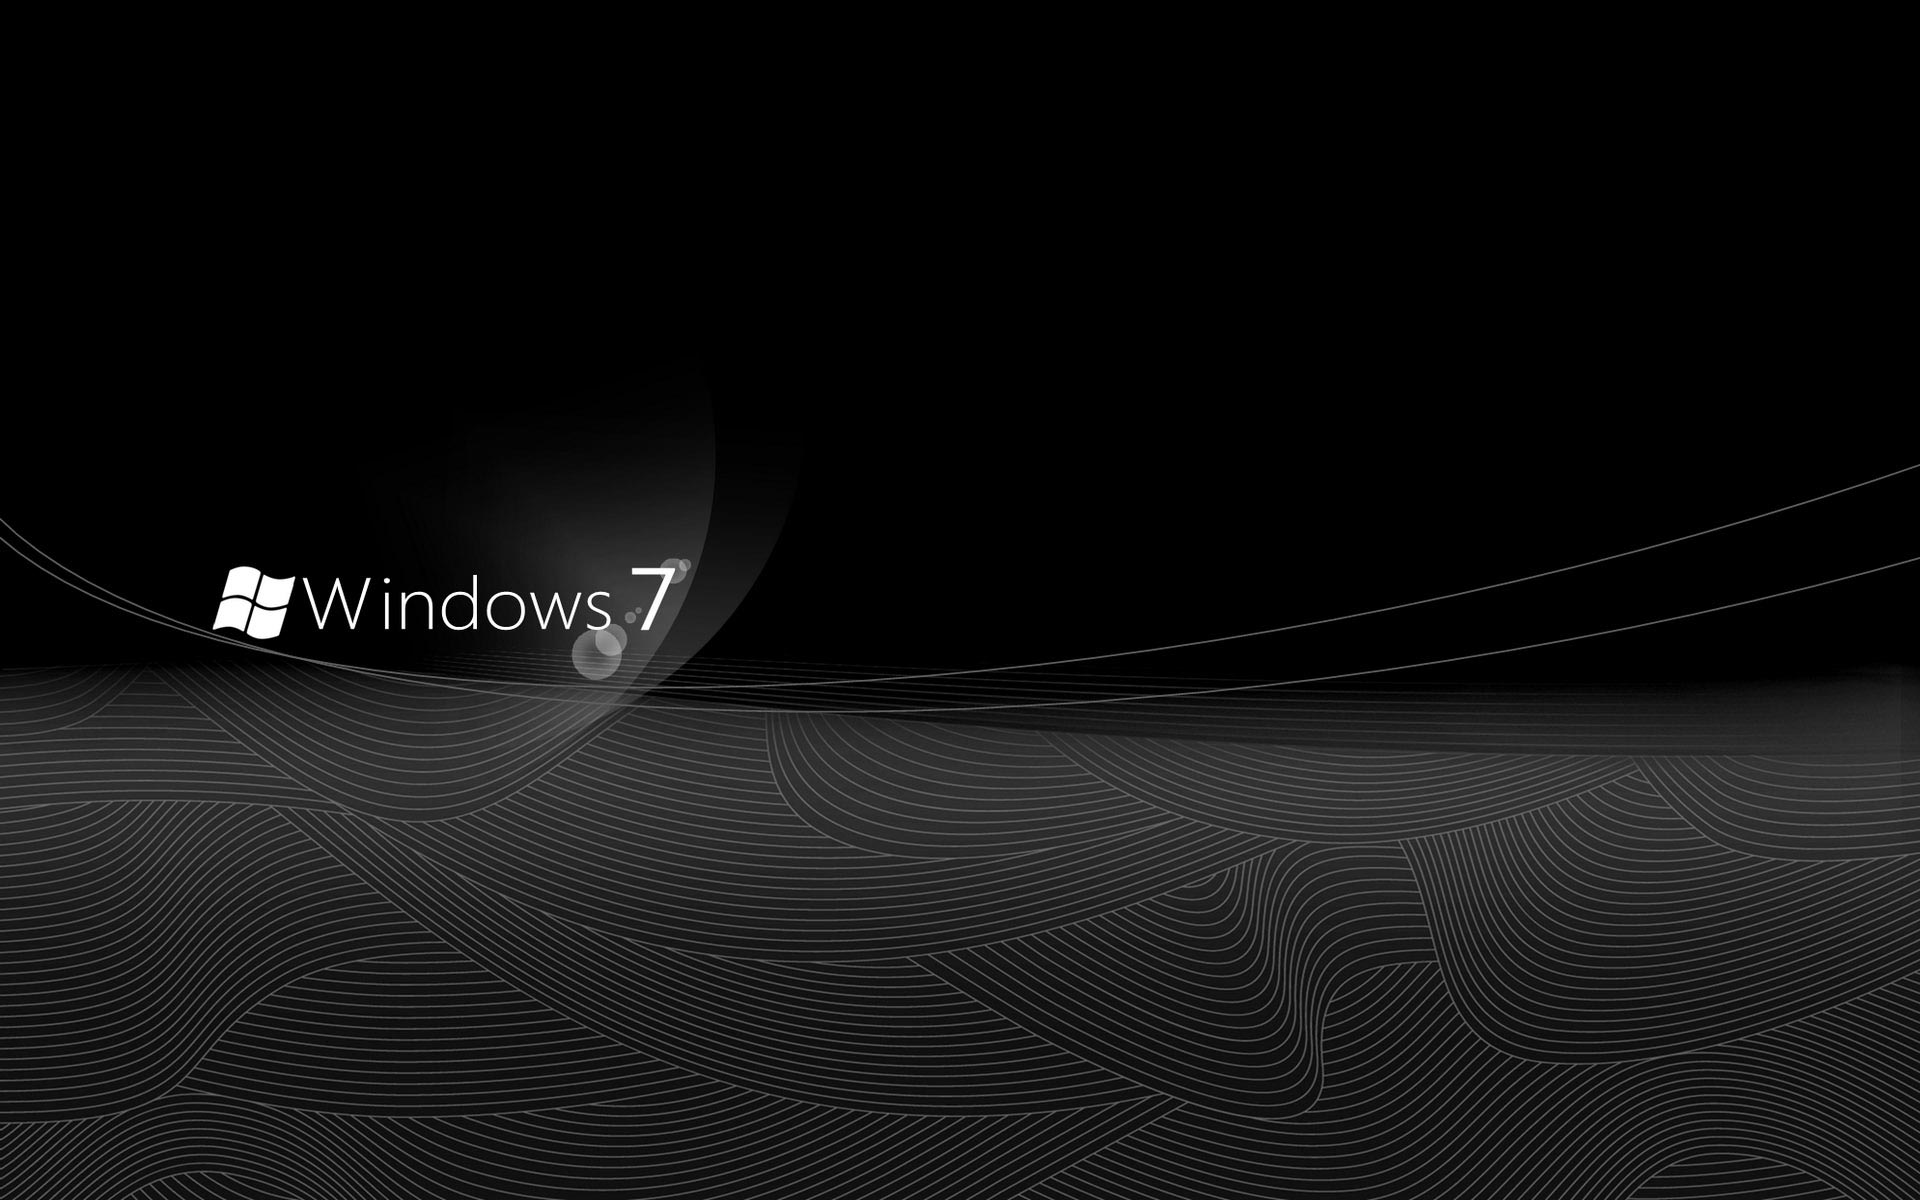 Download windows seven black 1024x768 wallpaper 1771 - Windows 7 Elegant Black Desktop Wallpaper And Make This Wallpaper For